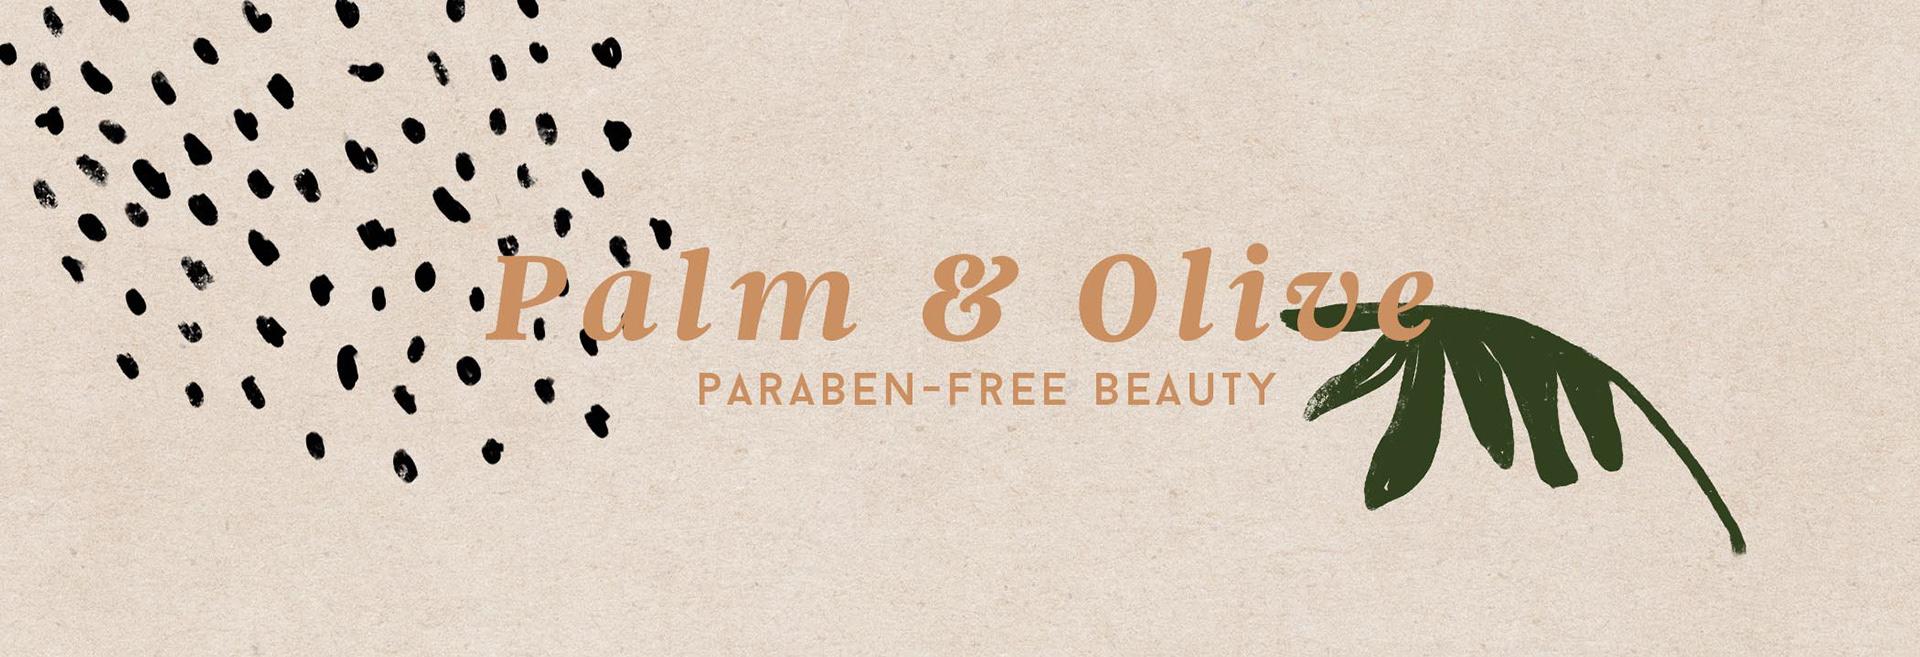 palm & olive.jpg